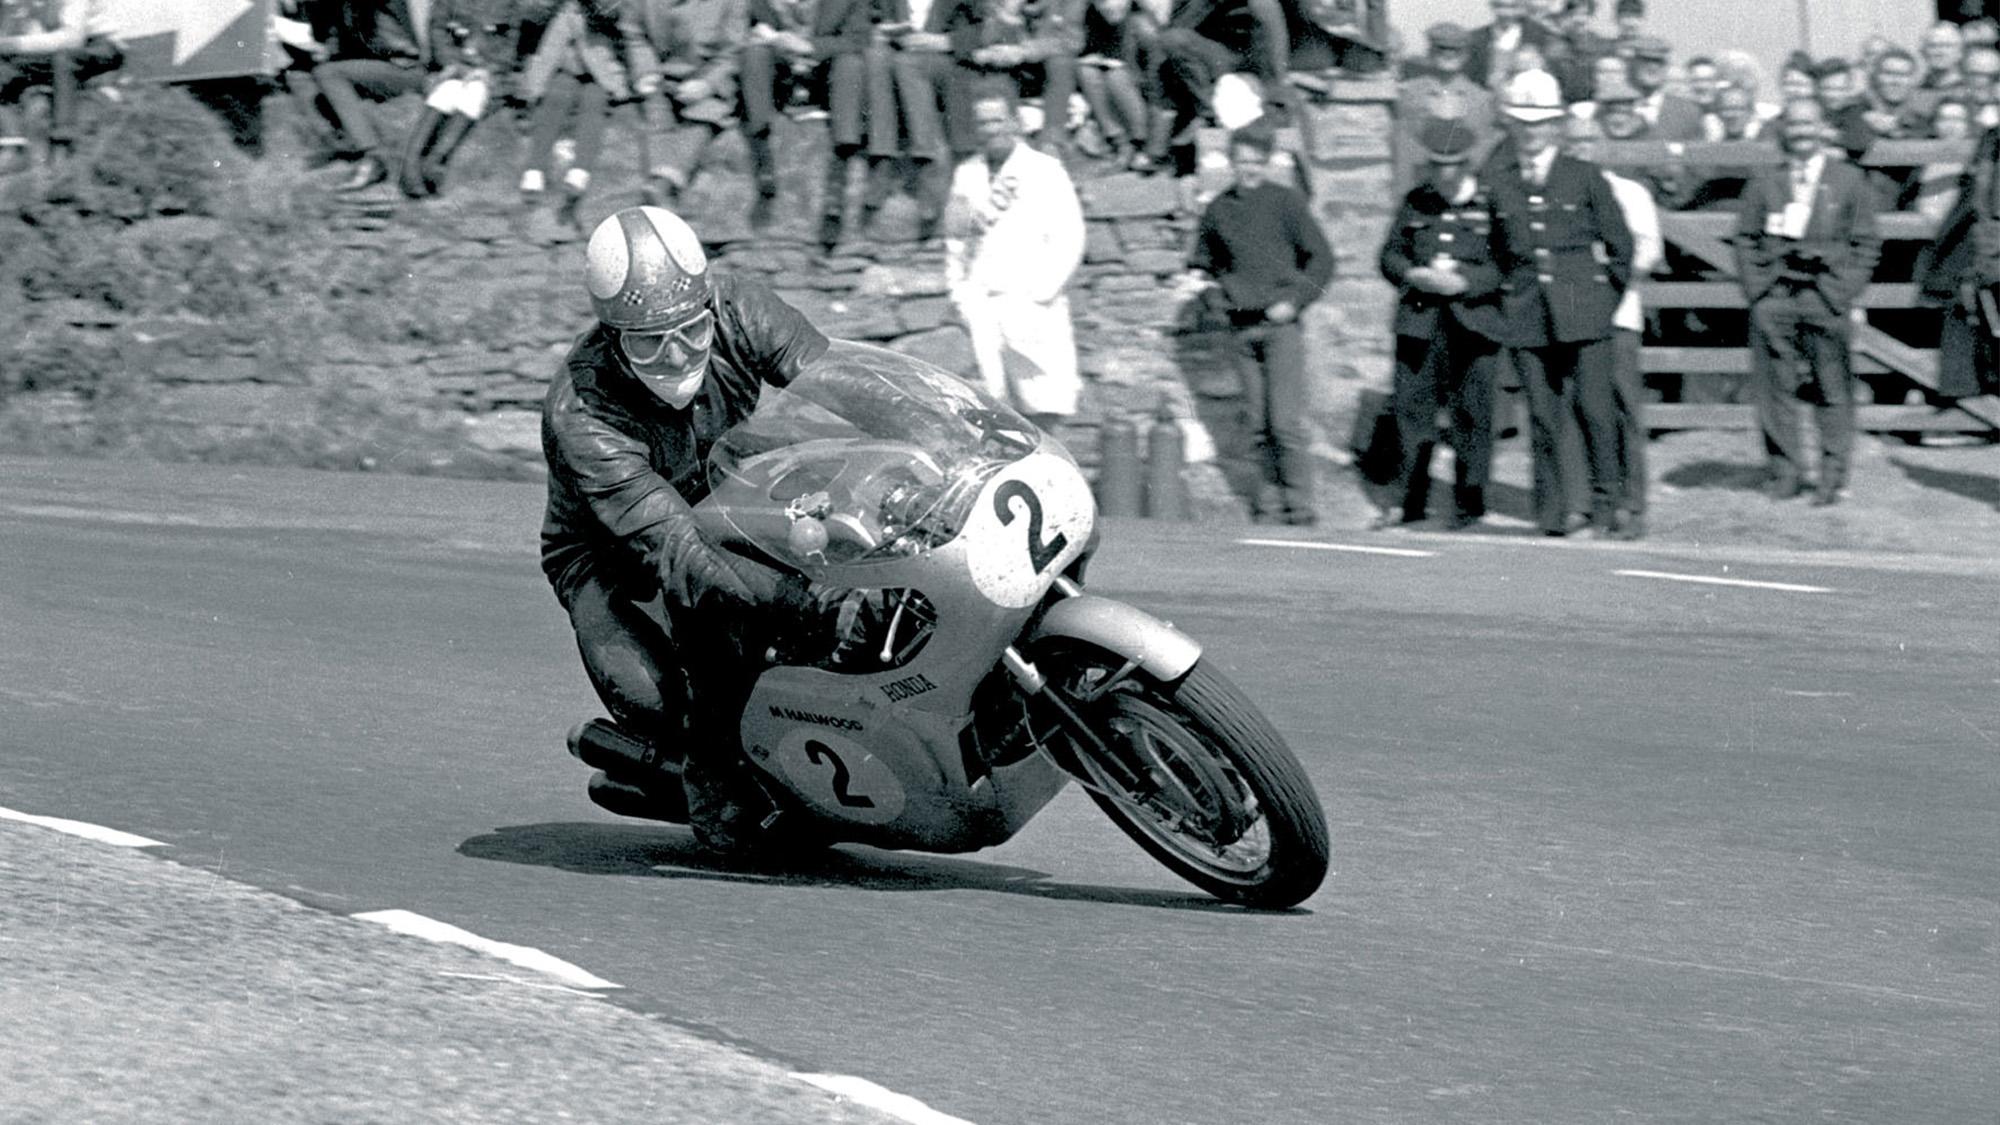 Mike Hailwood at the 1966 Isle of Man TT